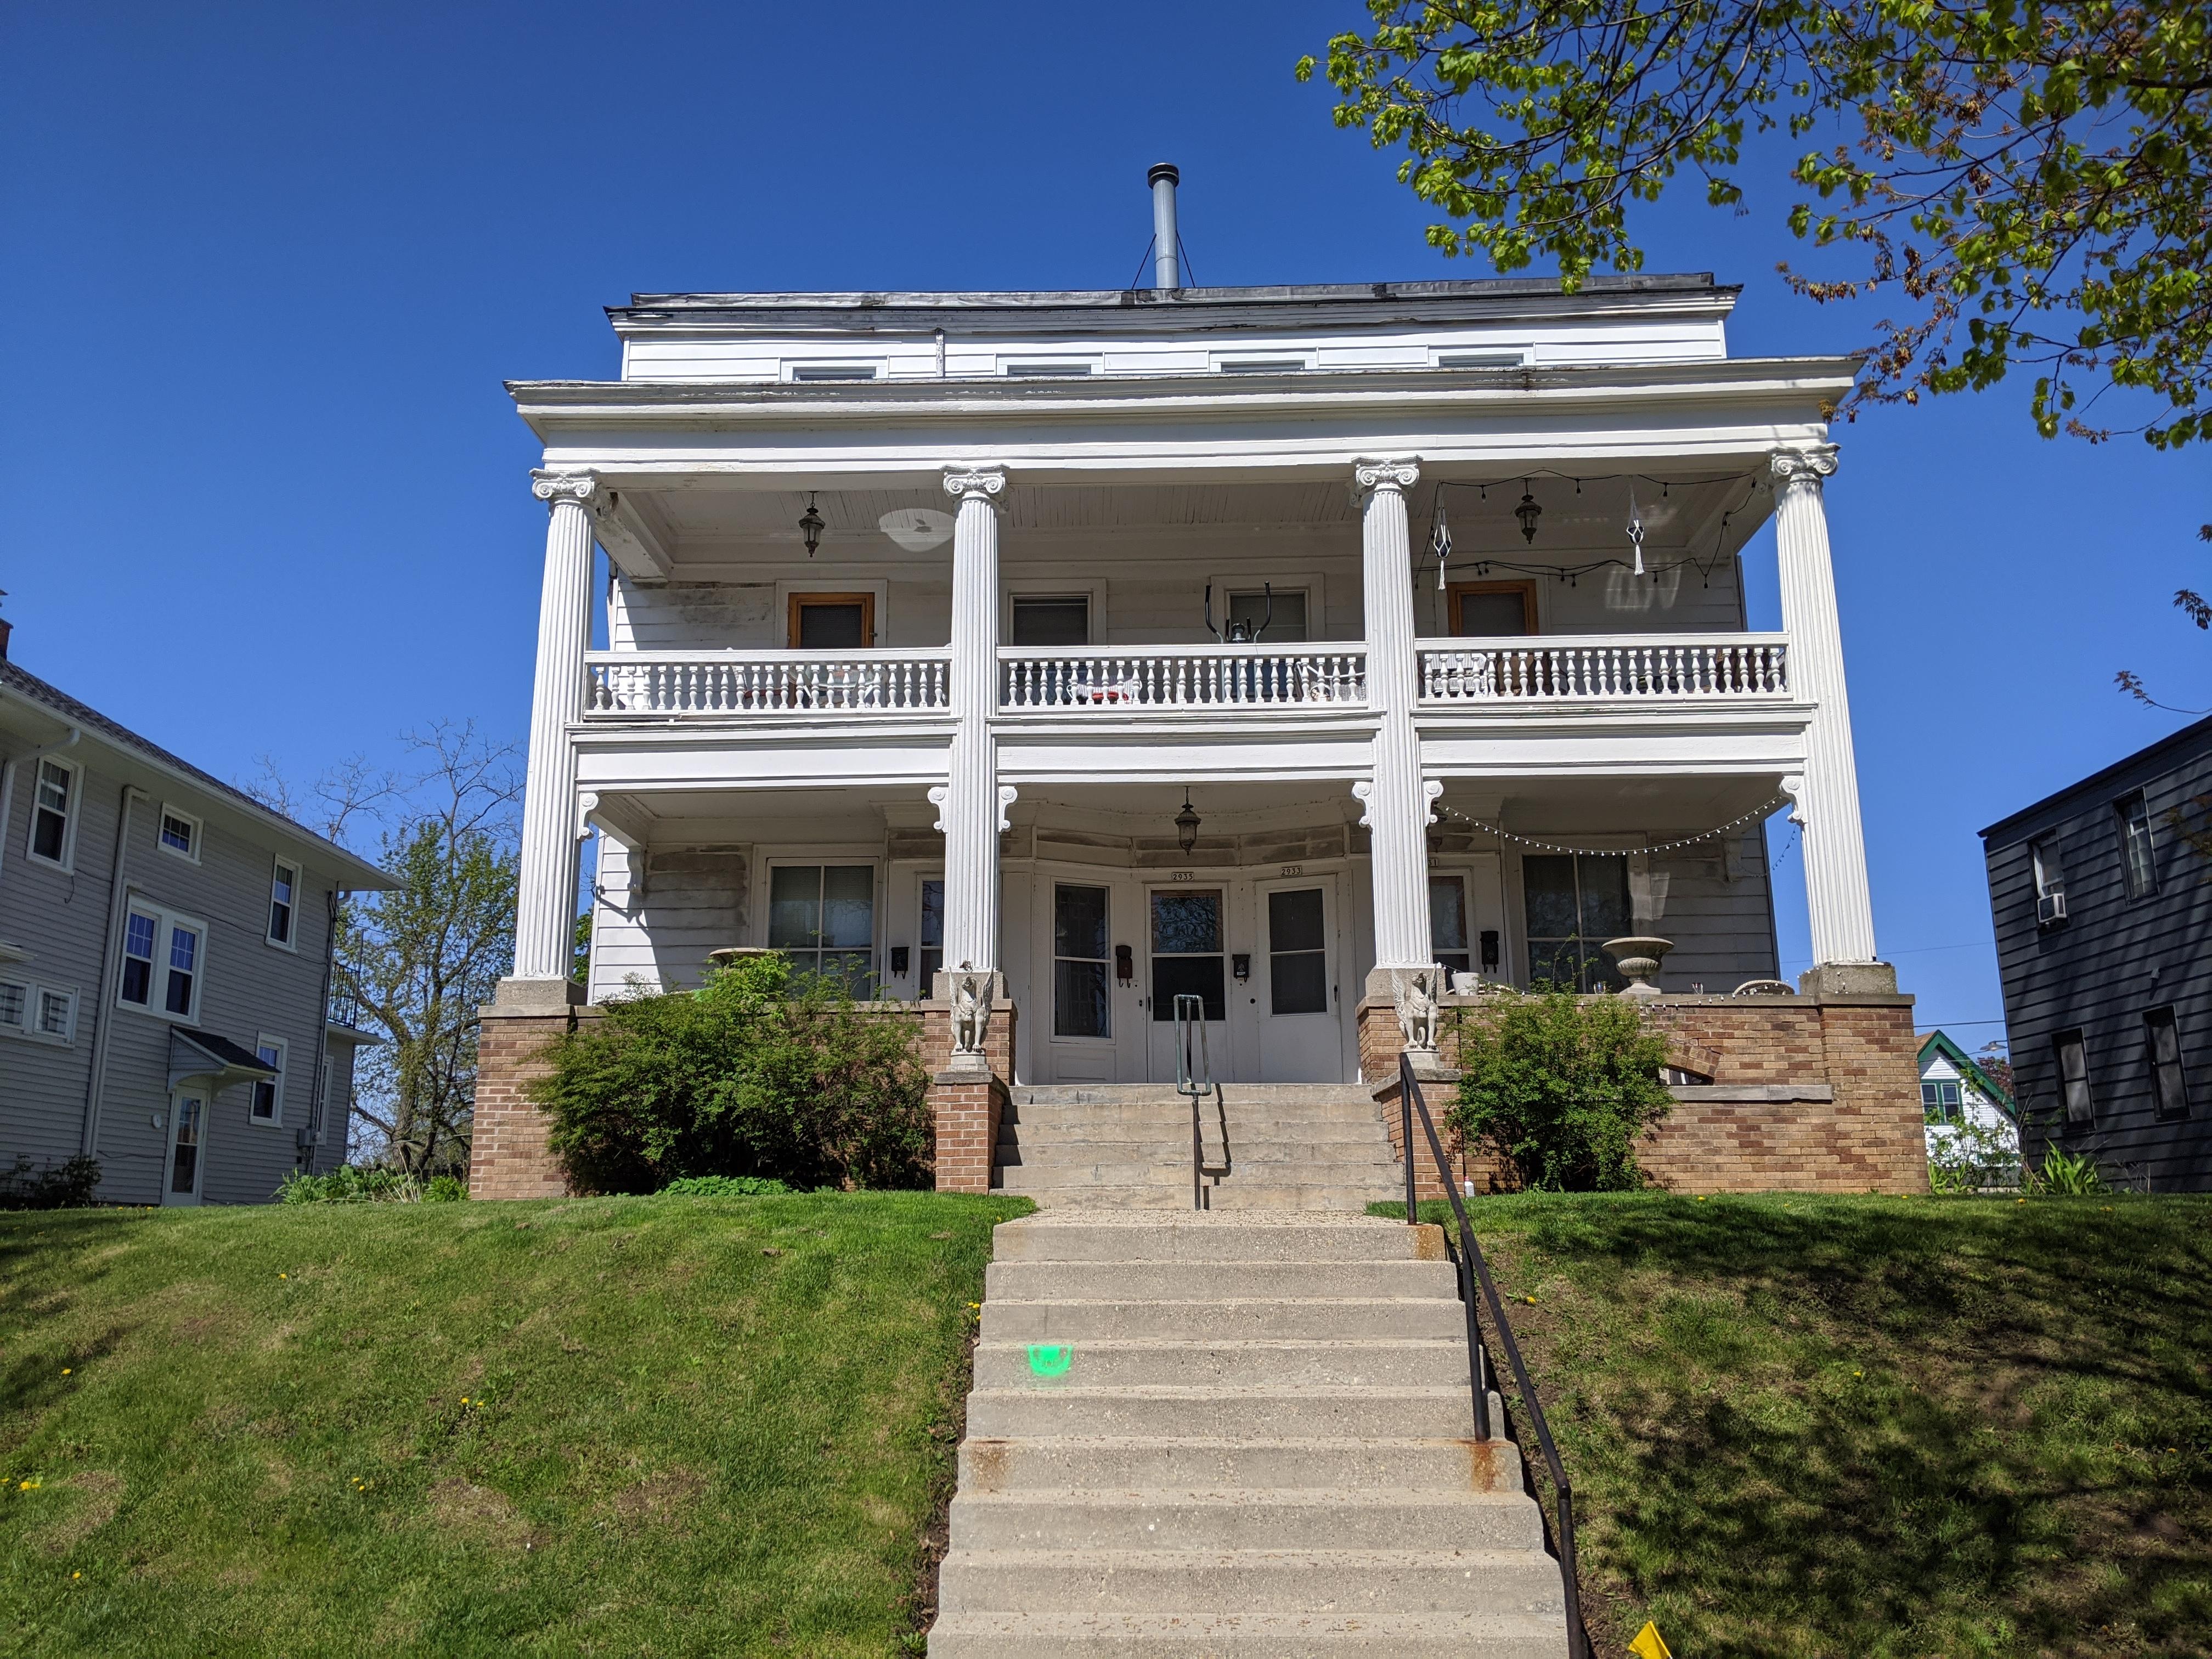 Henry Mann's home on S. Logan Avenue. Photo by Carl Baehr.